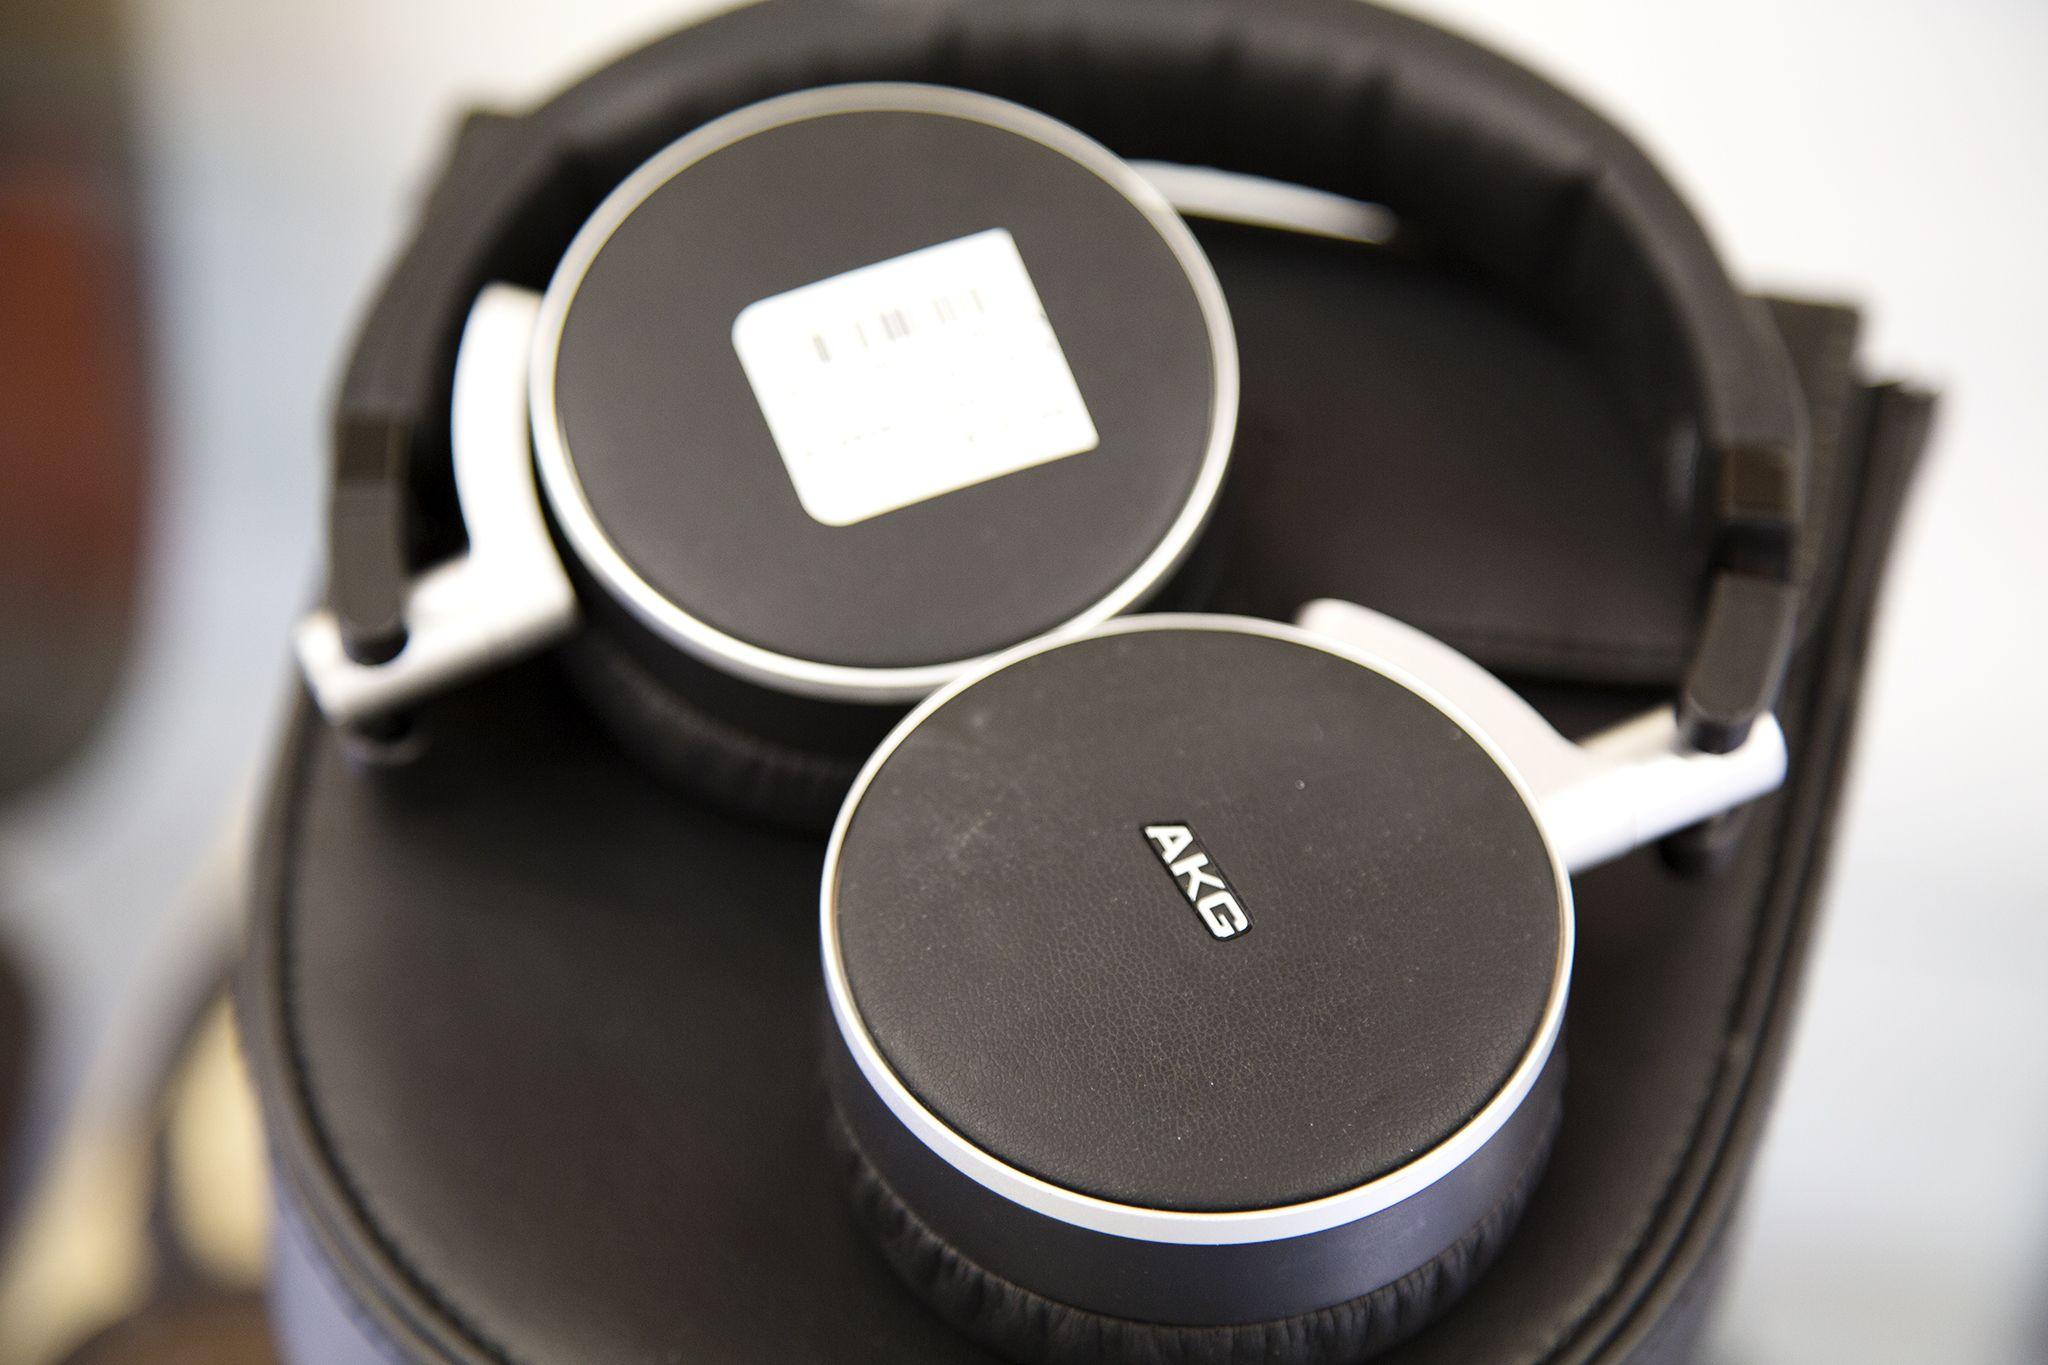 AKG Headphones. Akg headphones, Tech hacks, Akg